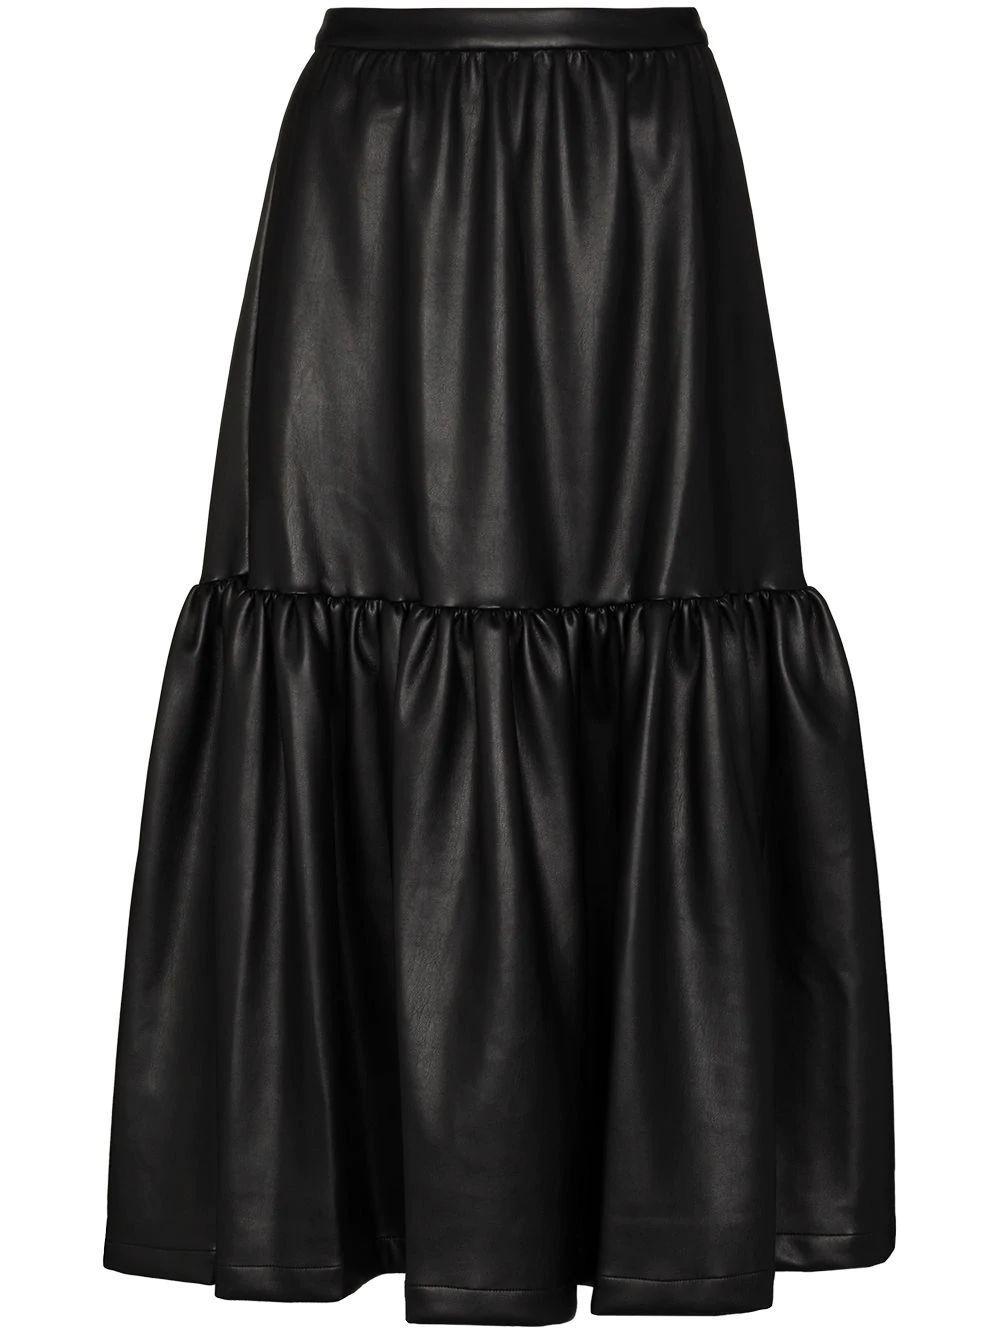 Orchid Vegan Leather Midi Skirt Item # 259-4075-WHI